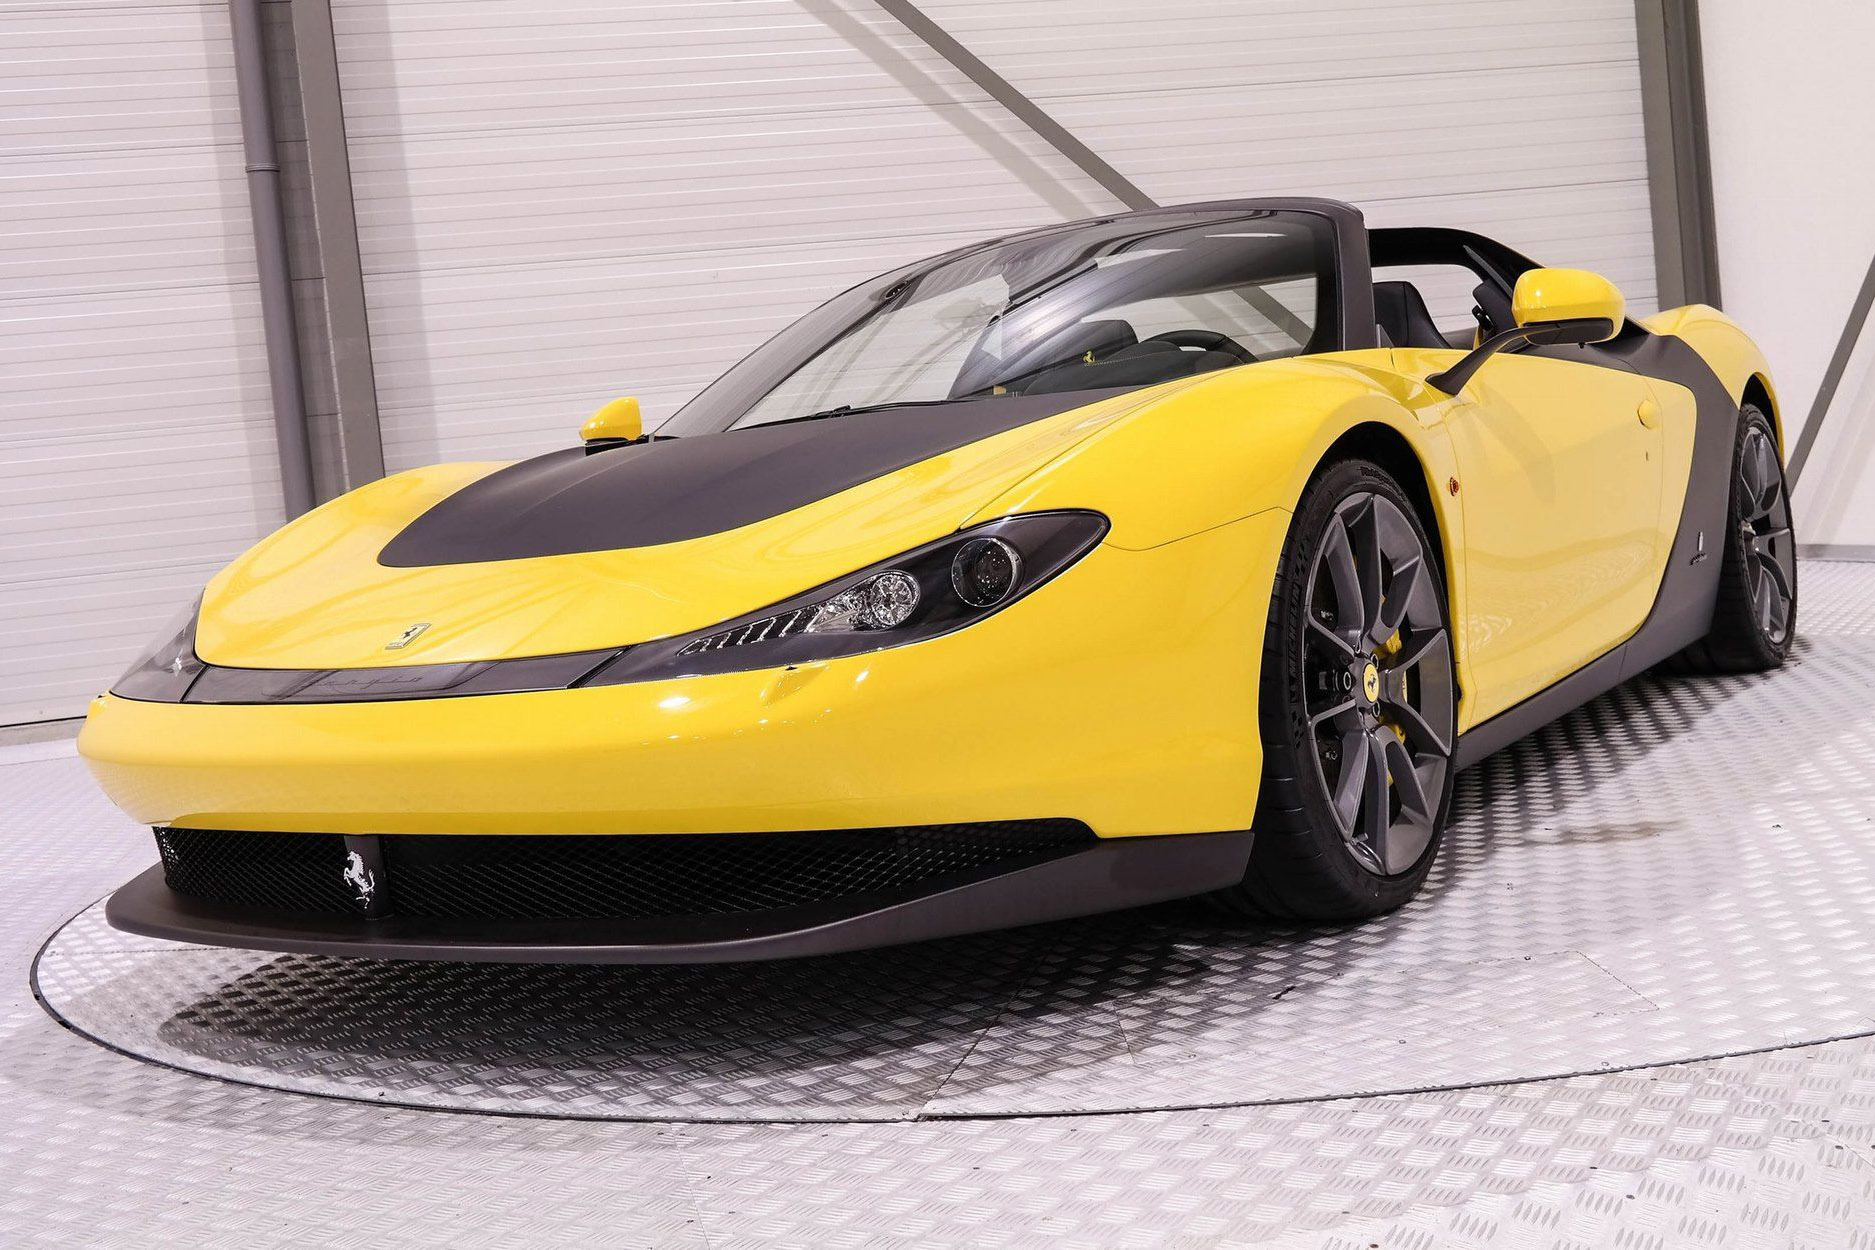 Ultra-rare Ferrari Sergio to fetch $6.4 million at auction